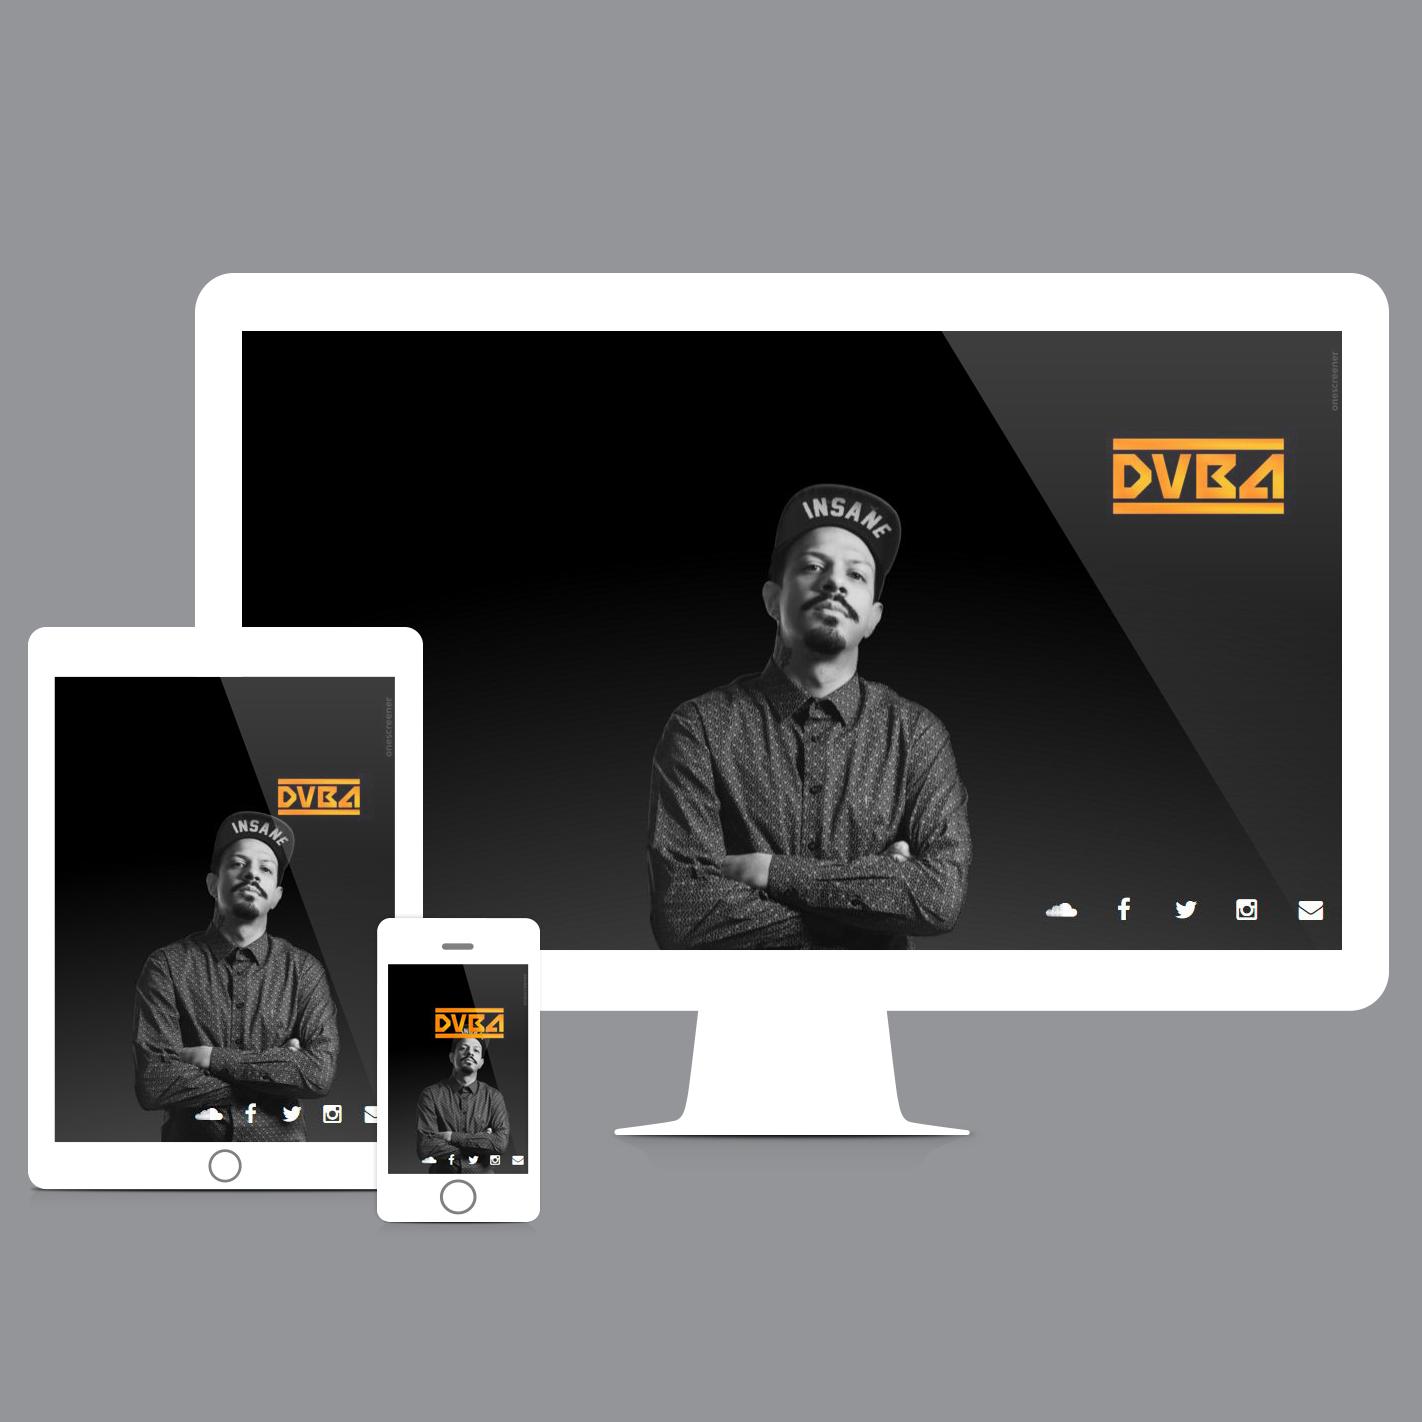 onescreener.com